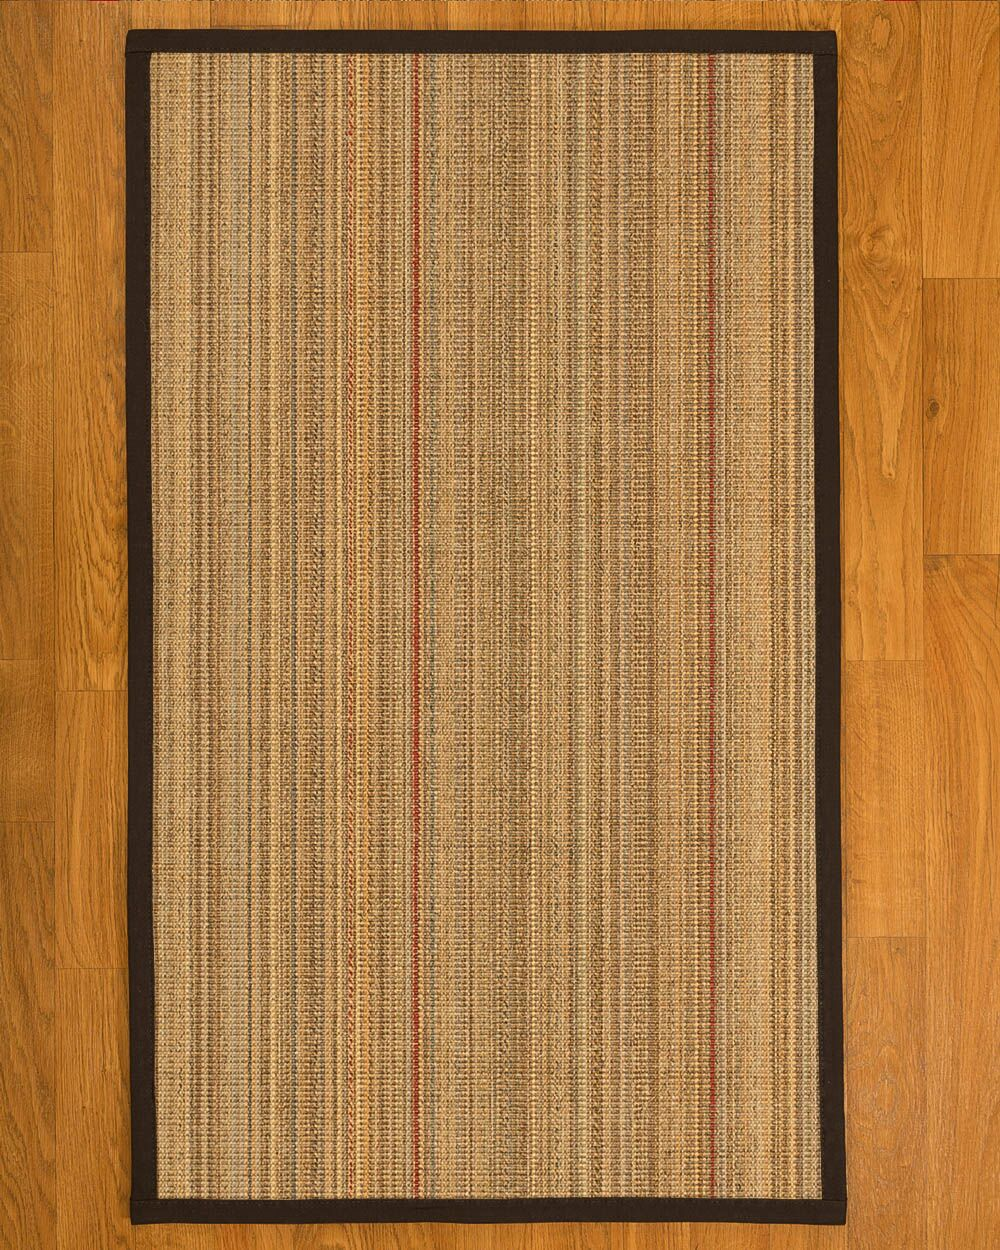 Aura Hand Woven Fiber Sisal Brown/Fudge Area Rug Rug Size: Rectangle 12' x 15'